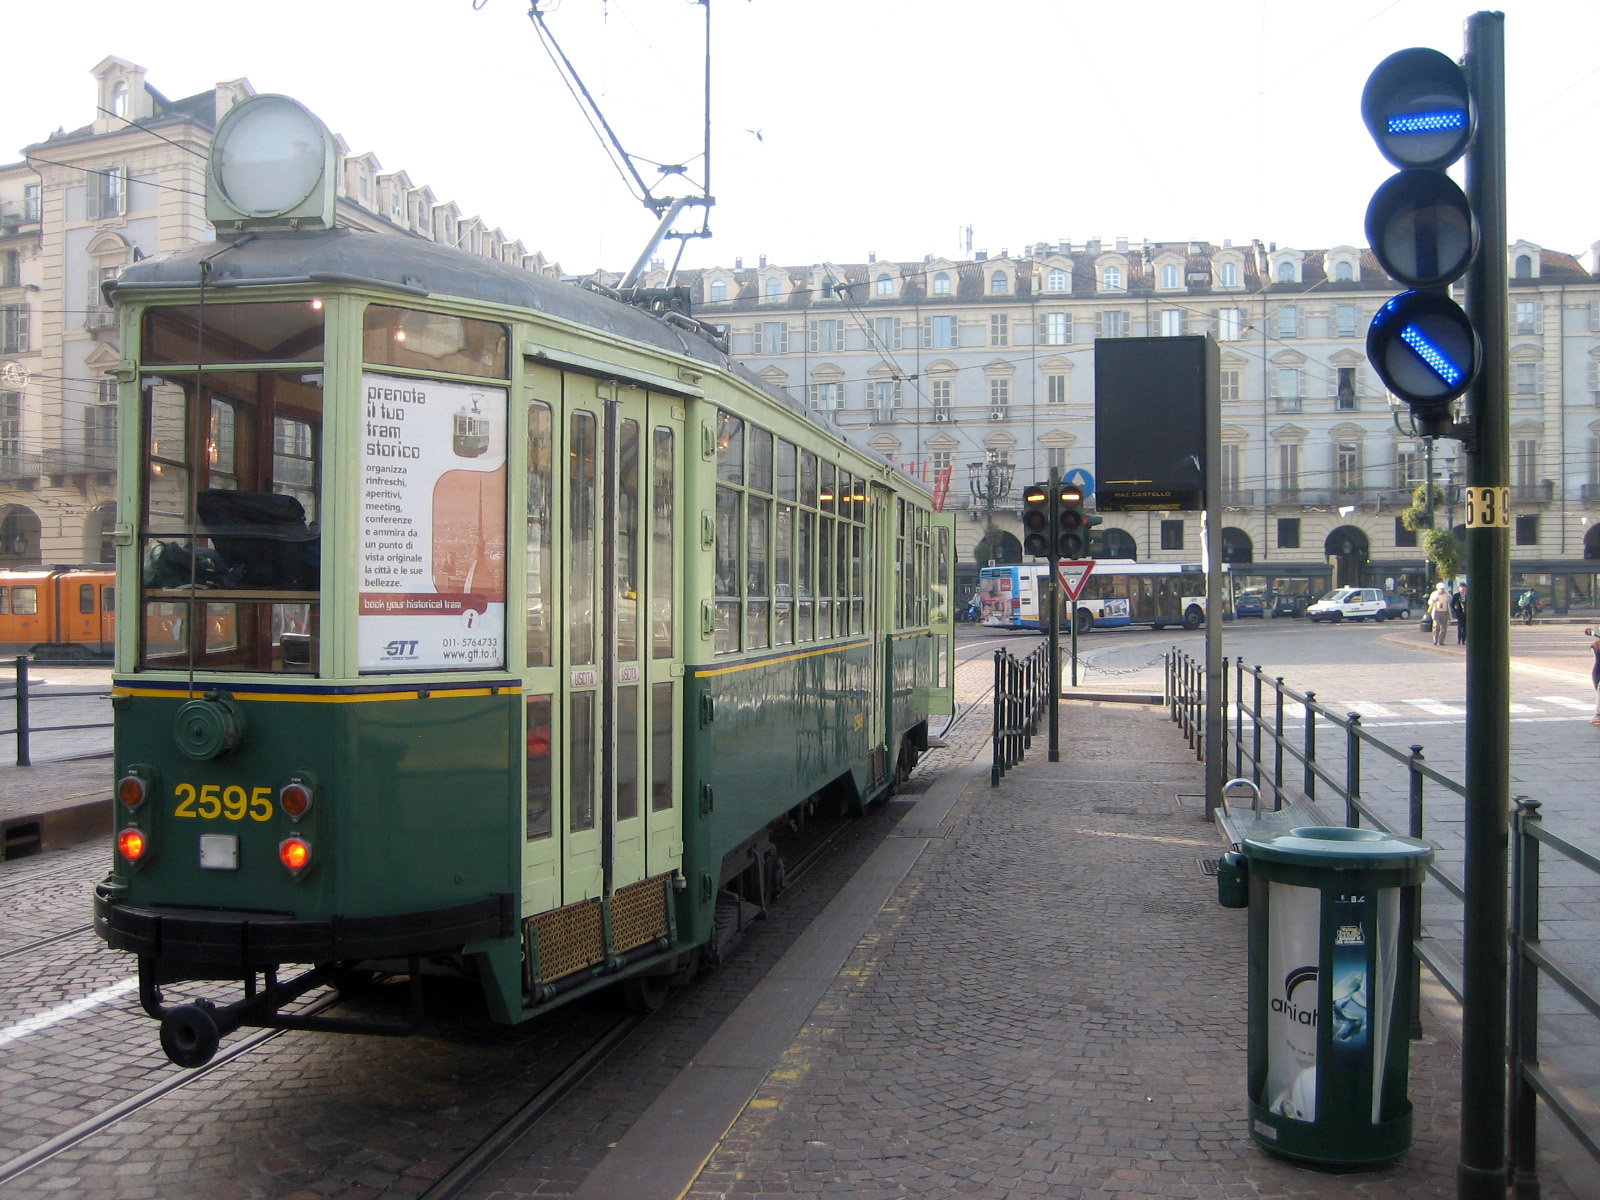 File:Torino tram 2595.jpg